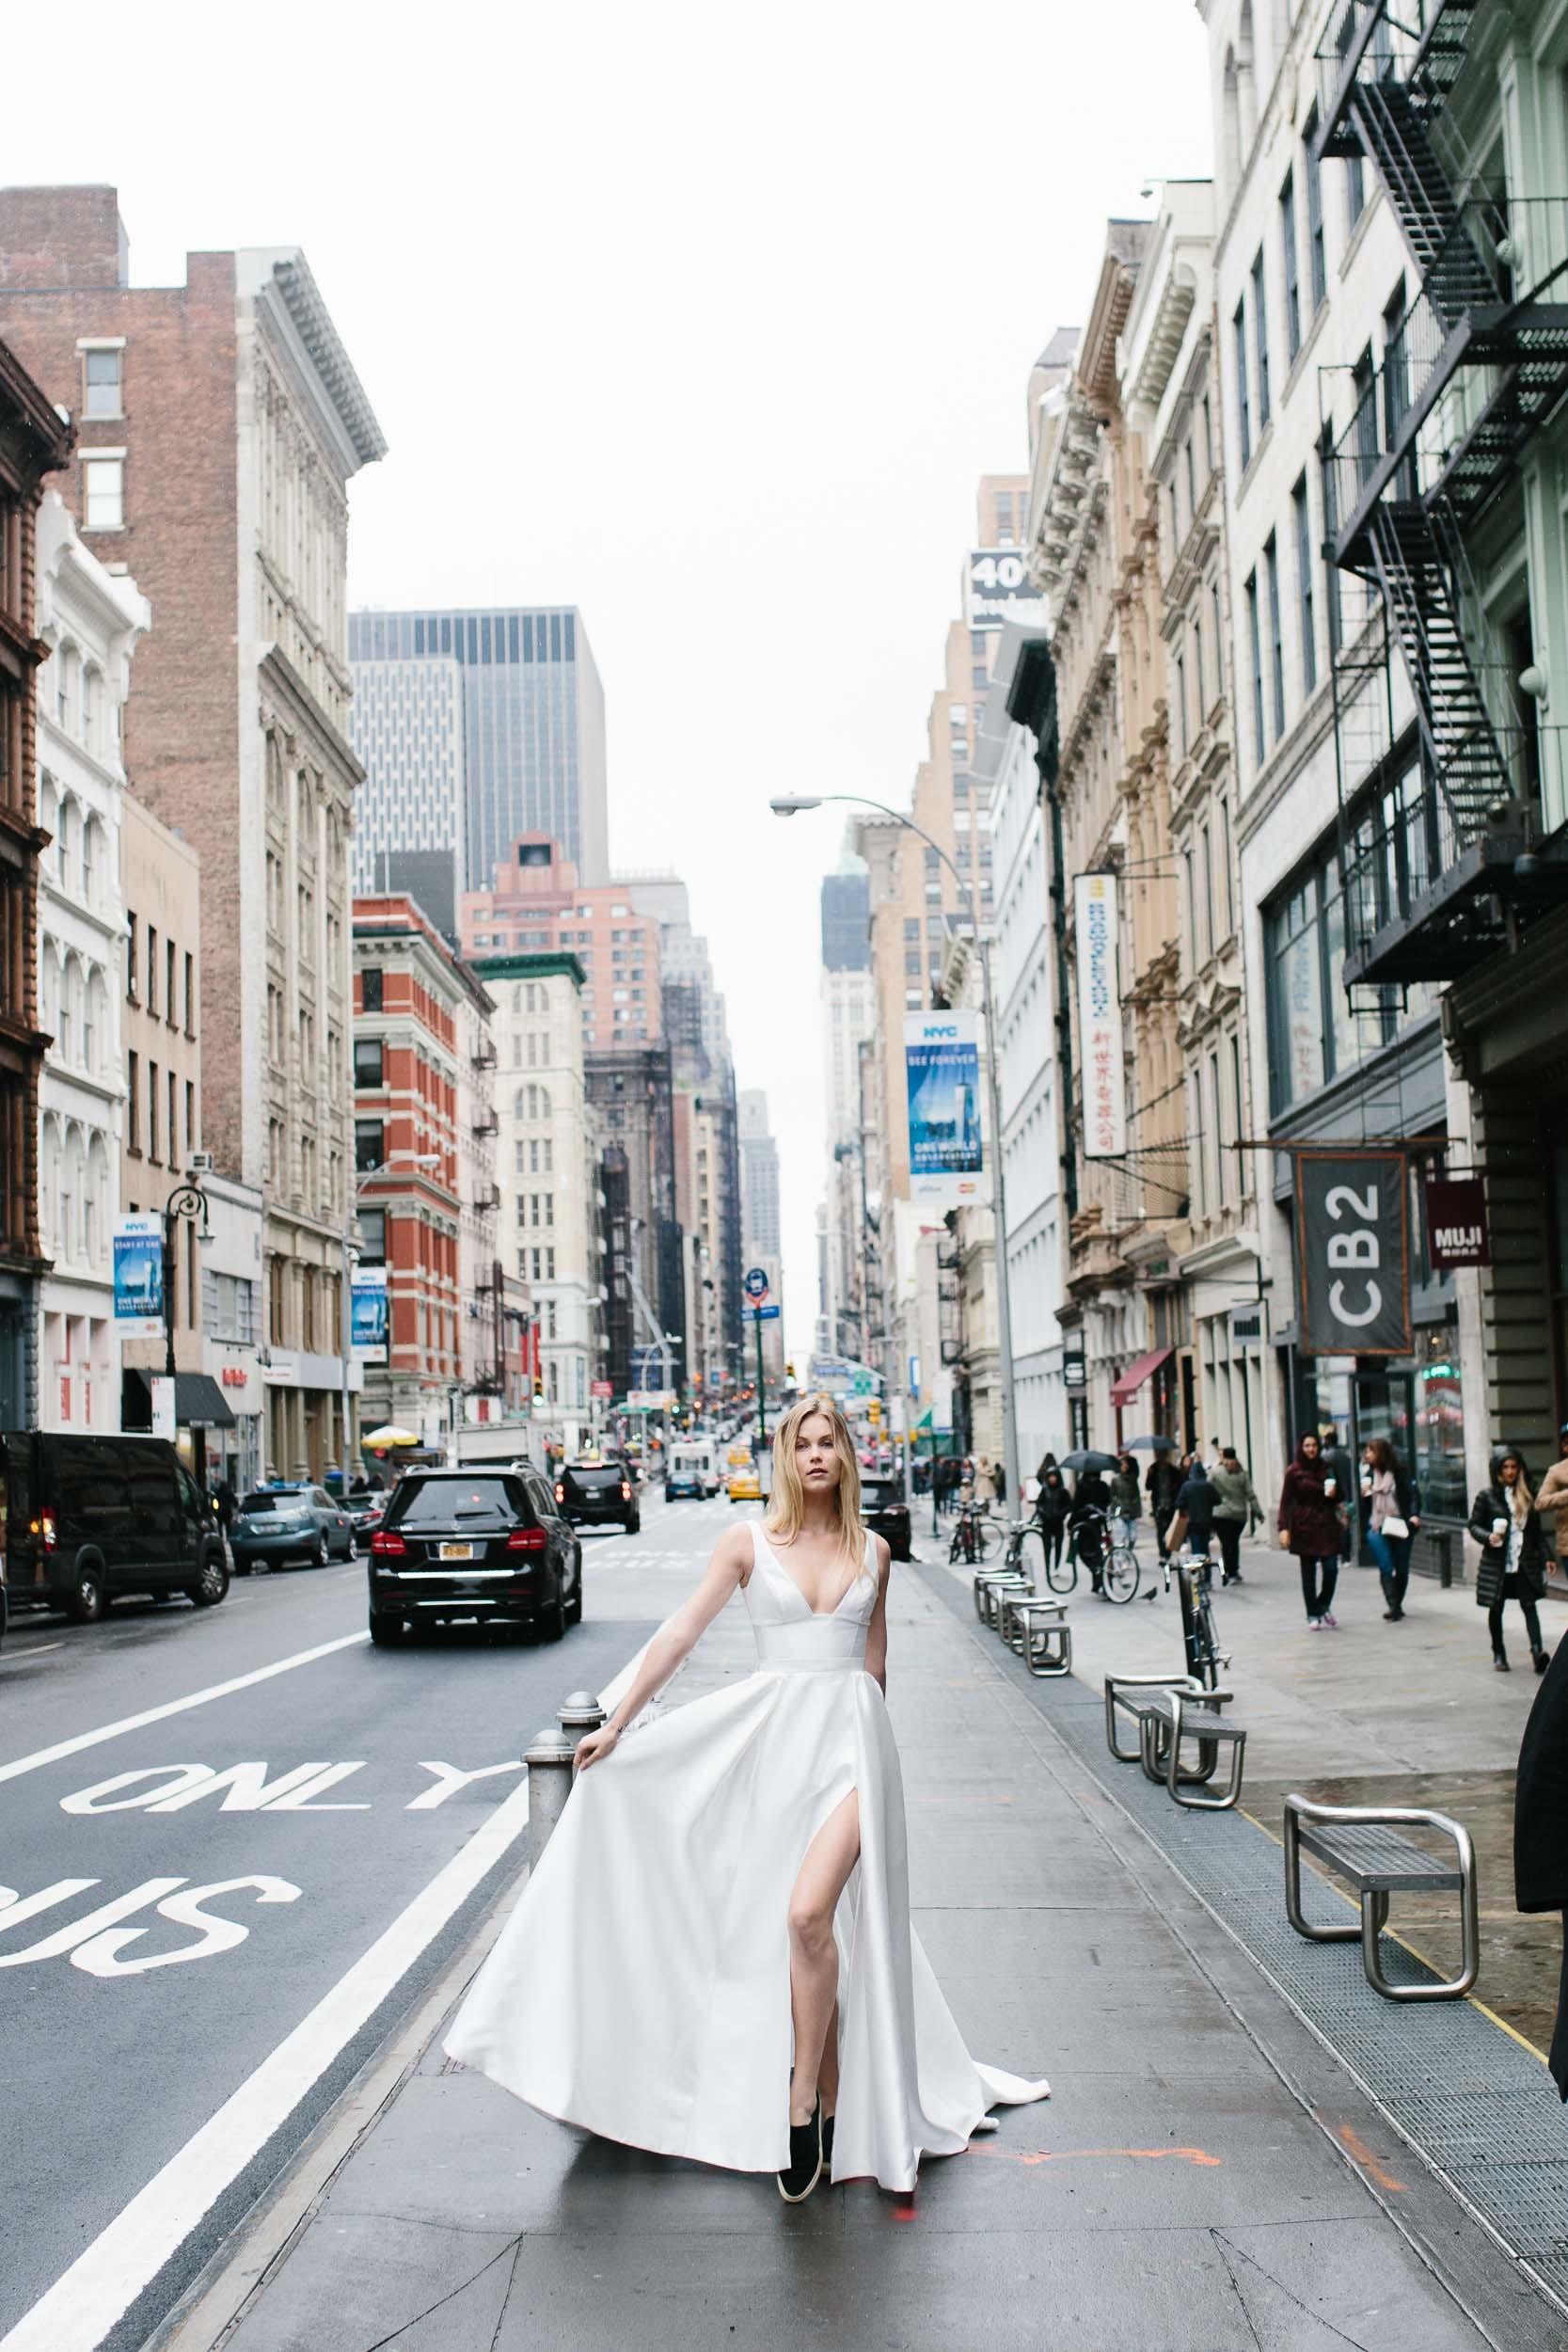 Kas-Richards-New-York-City-Wedding-Karen-Willis_Holmes-70.jpg